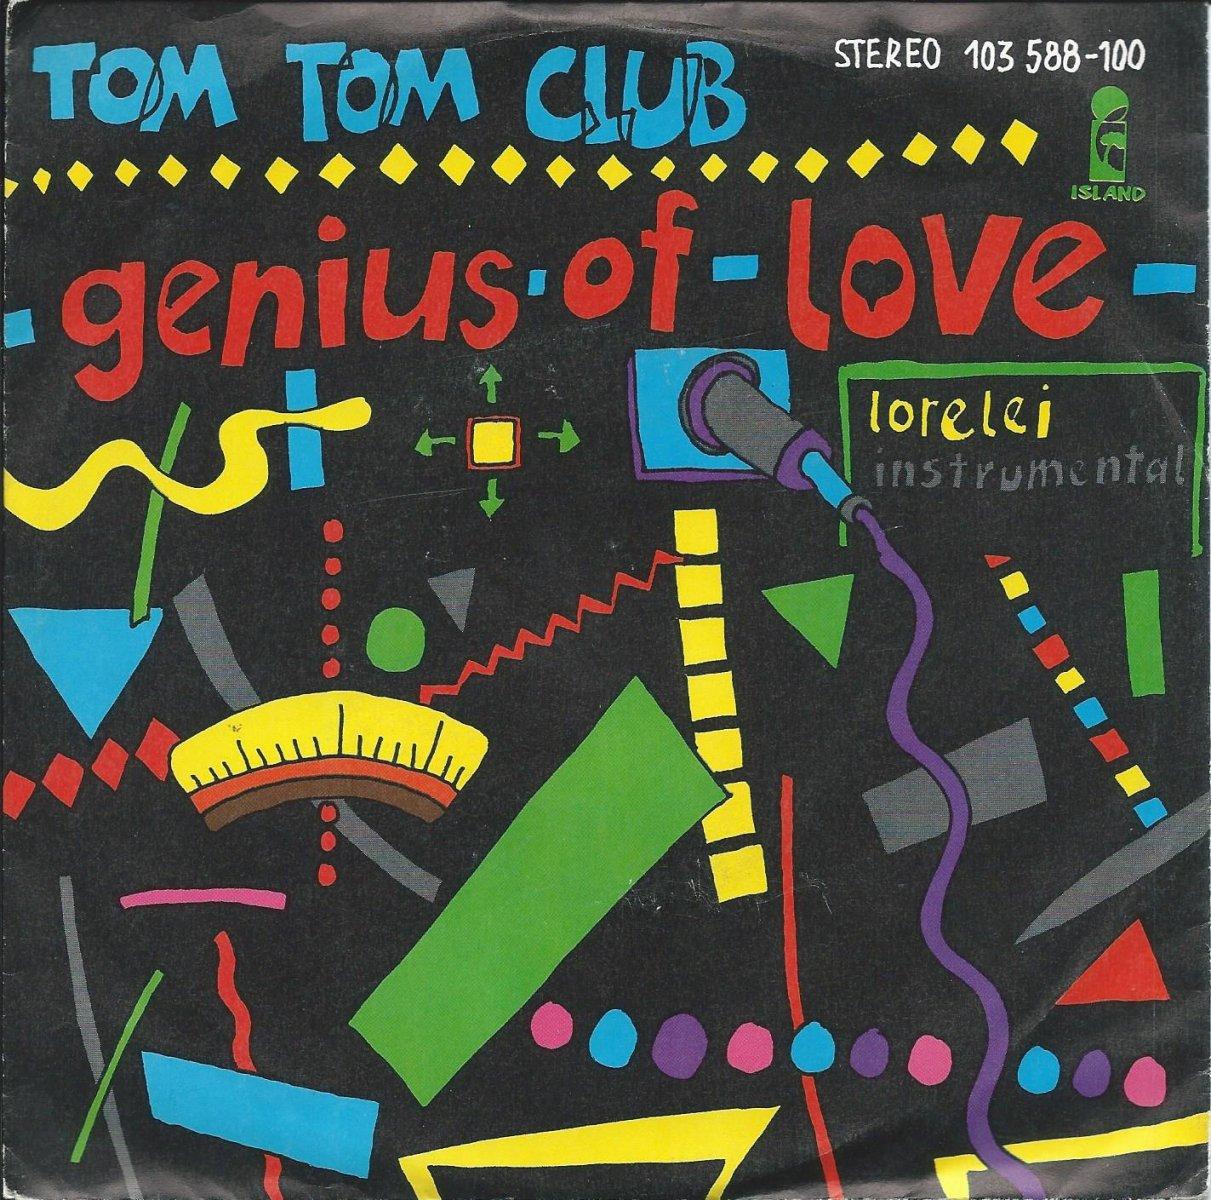 TOM TOM CLUB / GENIUS OF LOVE / LORELEI (INSTRUMENTAL) (7